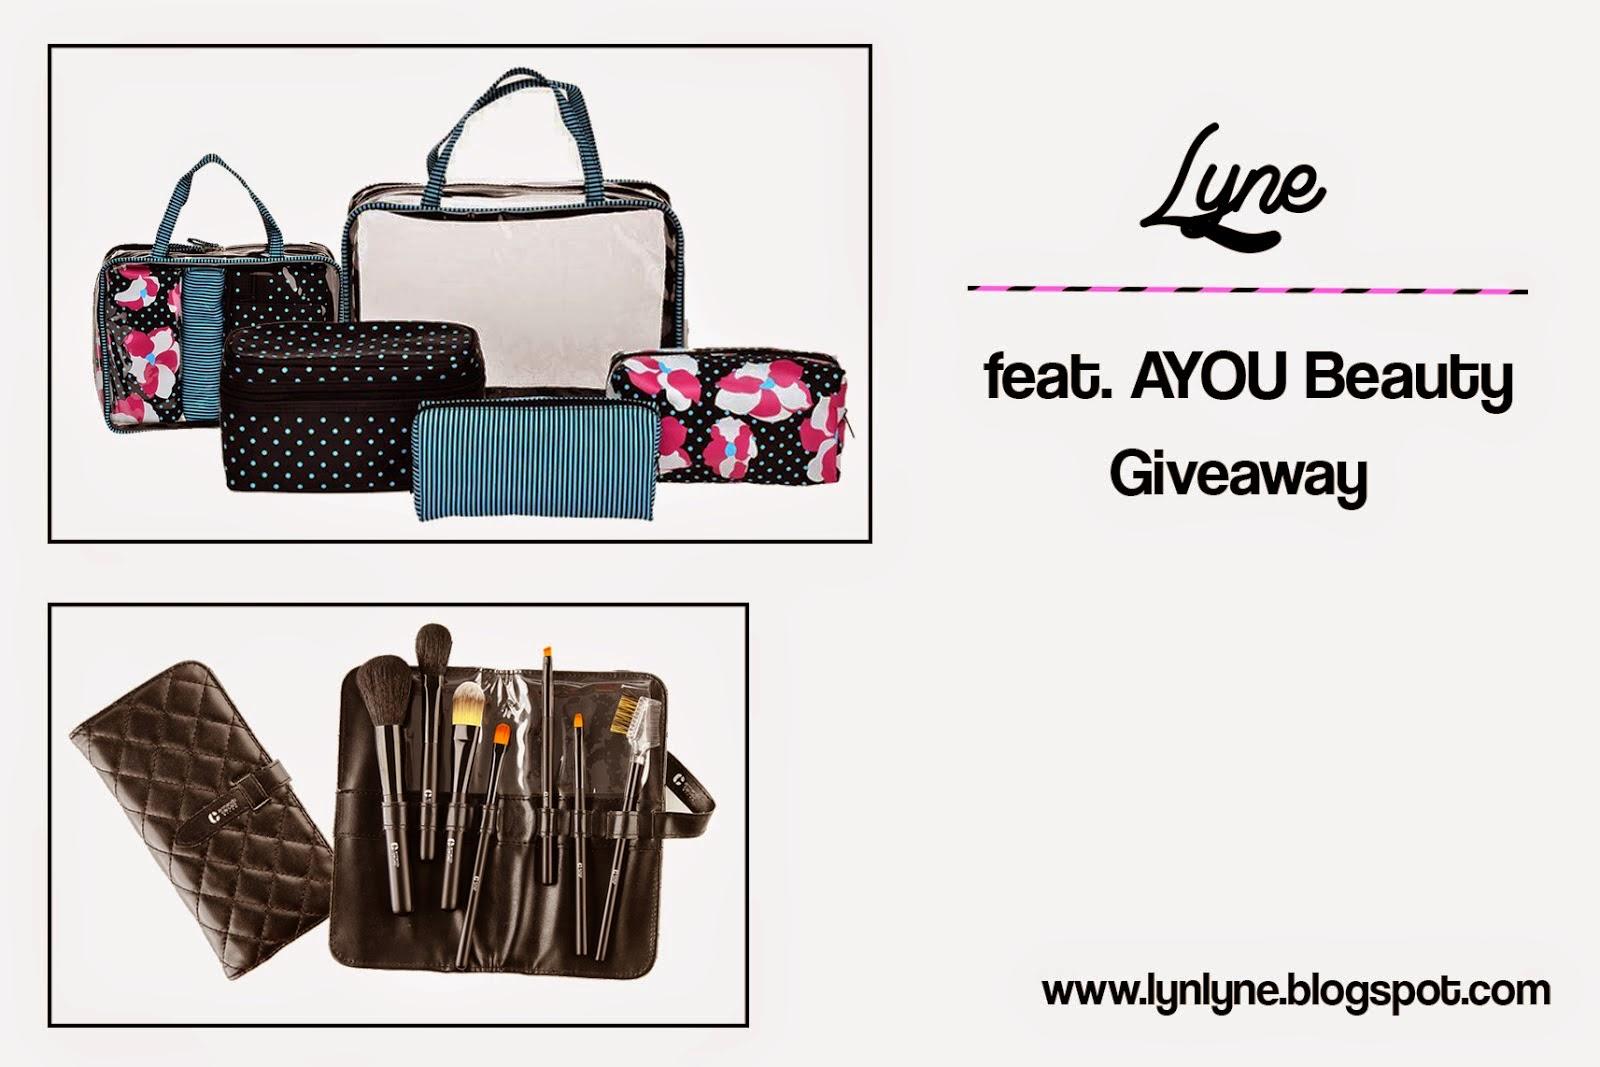 http://lynlyne.blogspot.com/2014/07/lyne-feat-ayou-beauty-giveaway.html